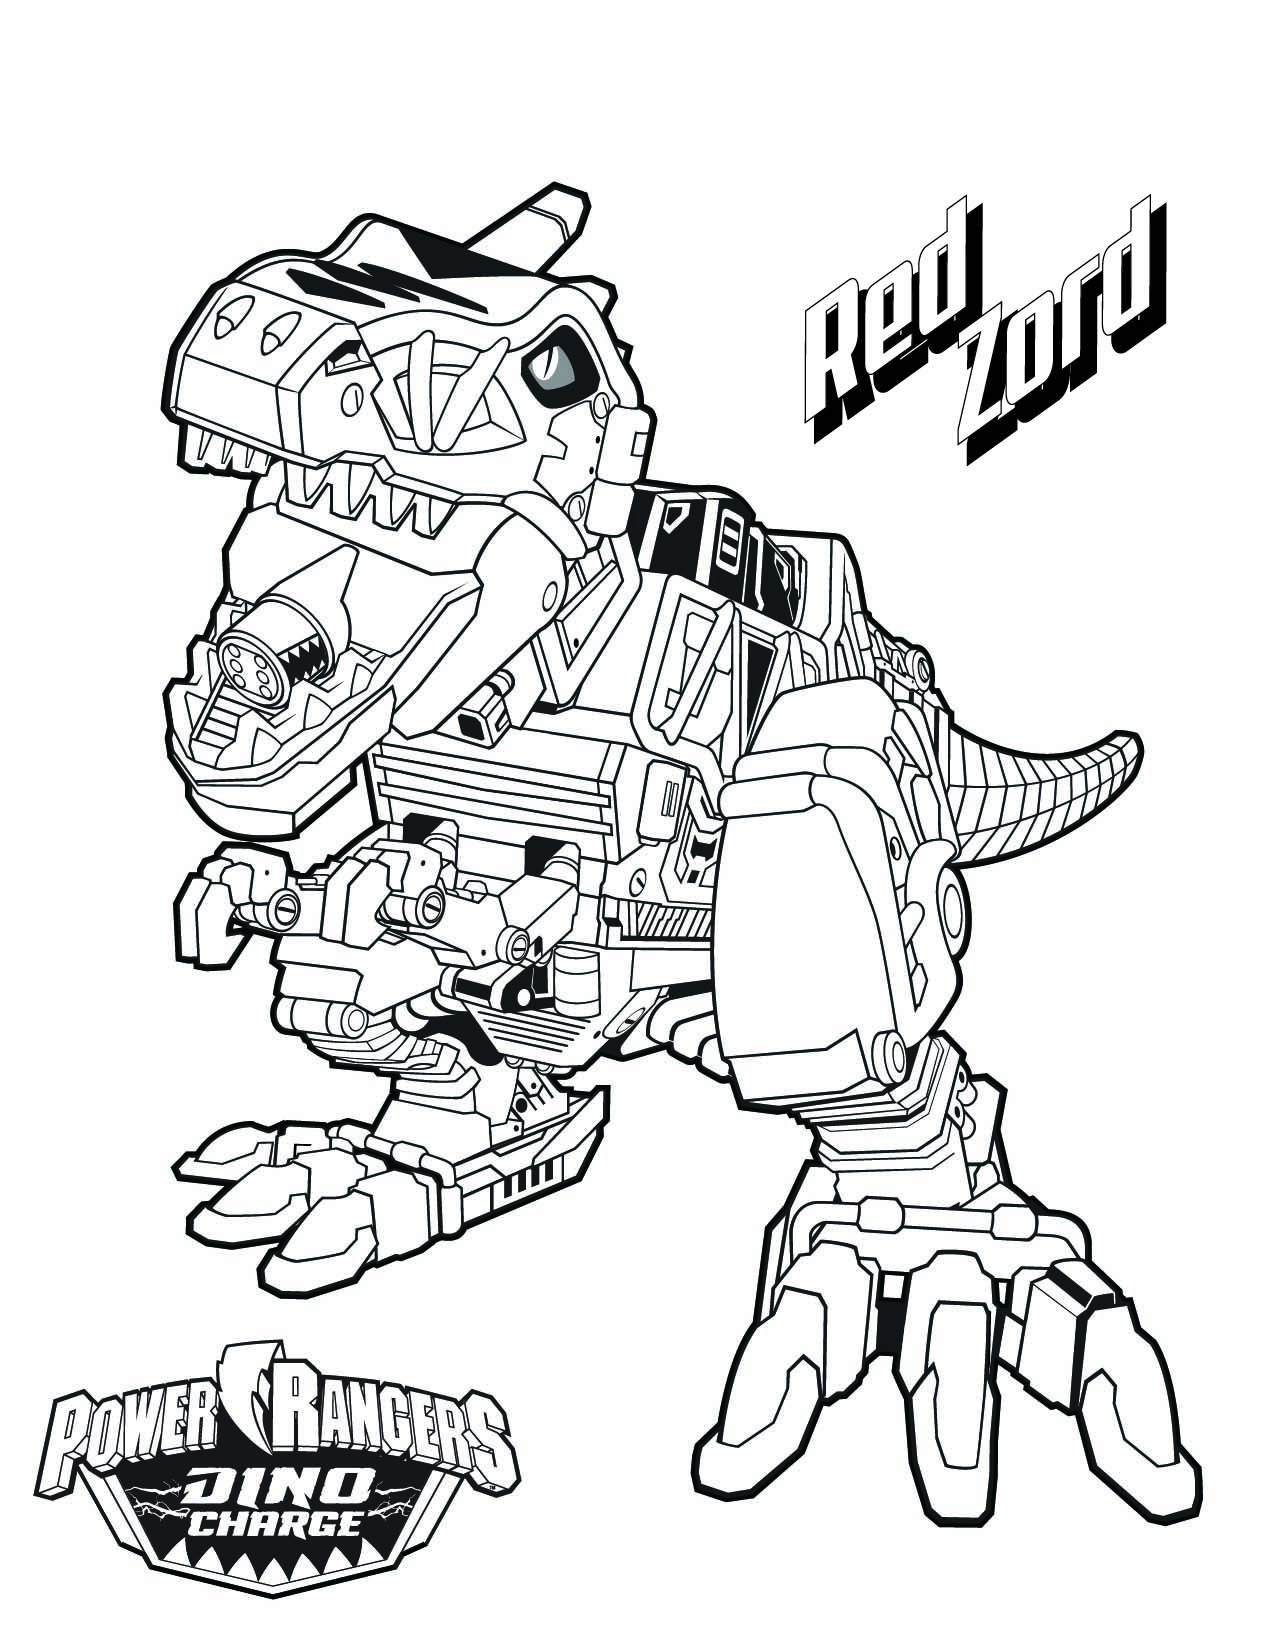 dessin de power rangers